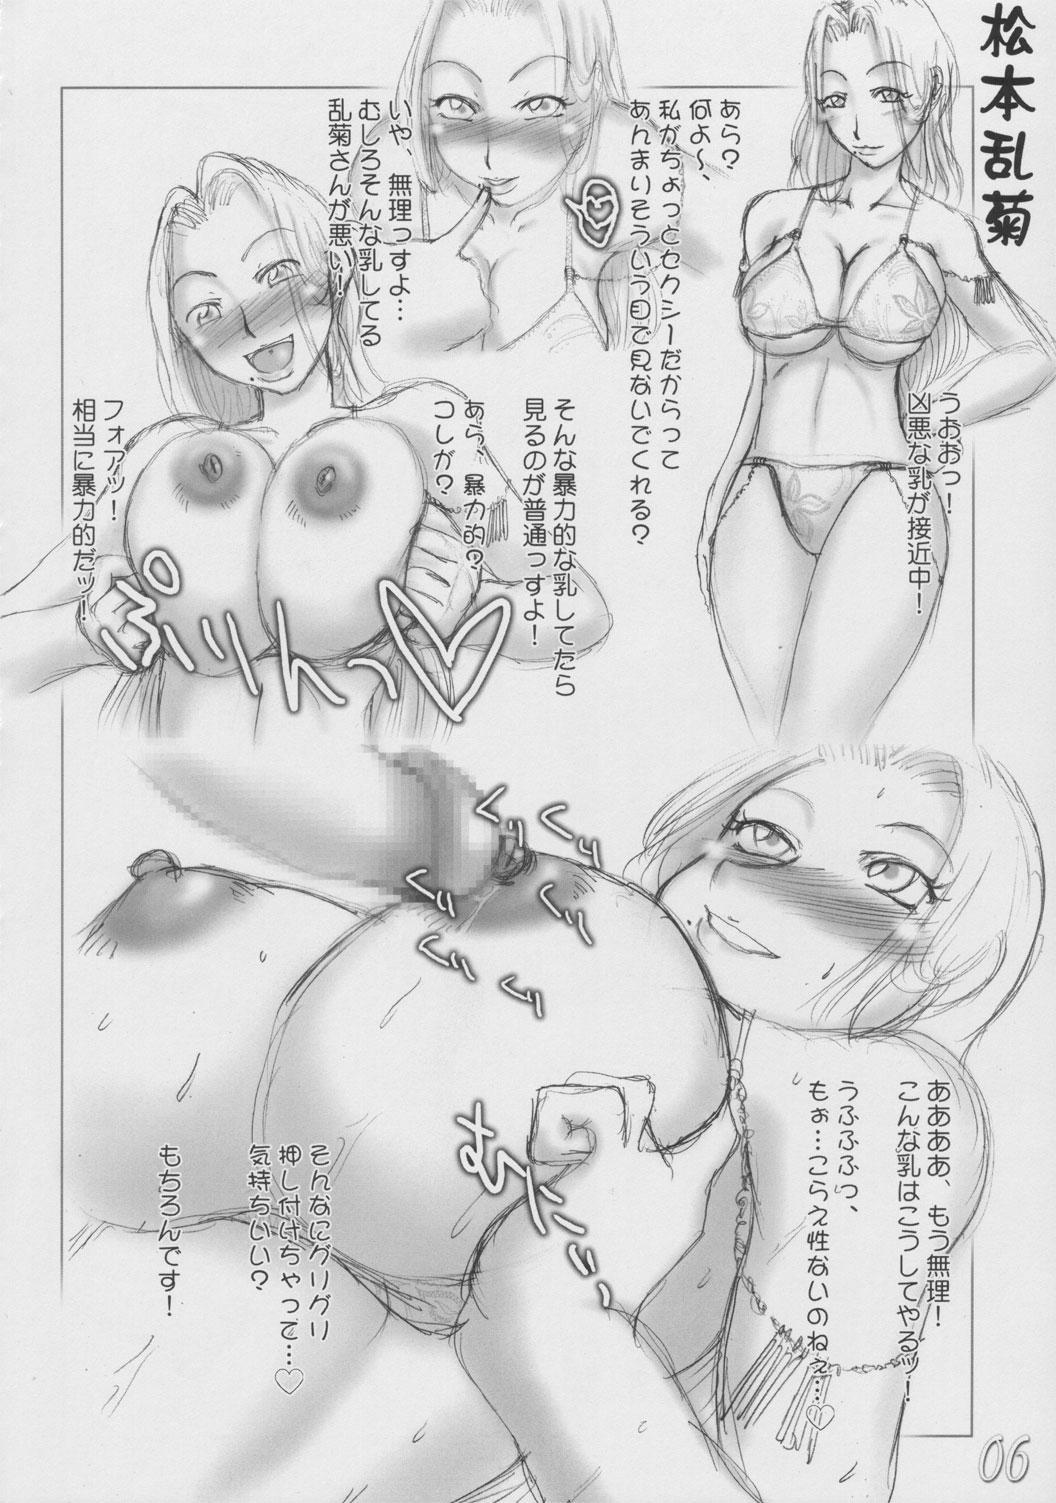 (ComiComi8) [HIGHWAY-SENMU (Maban, Saikoubi)] H-Sen vol. 8 -Erotical noma noma iei!!- (BLEACH) 4